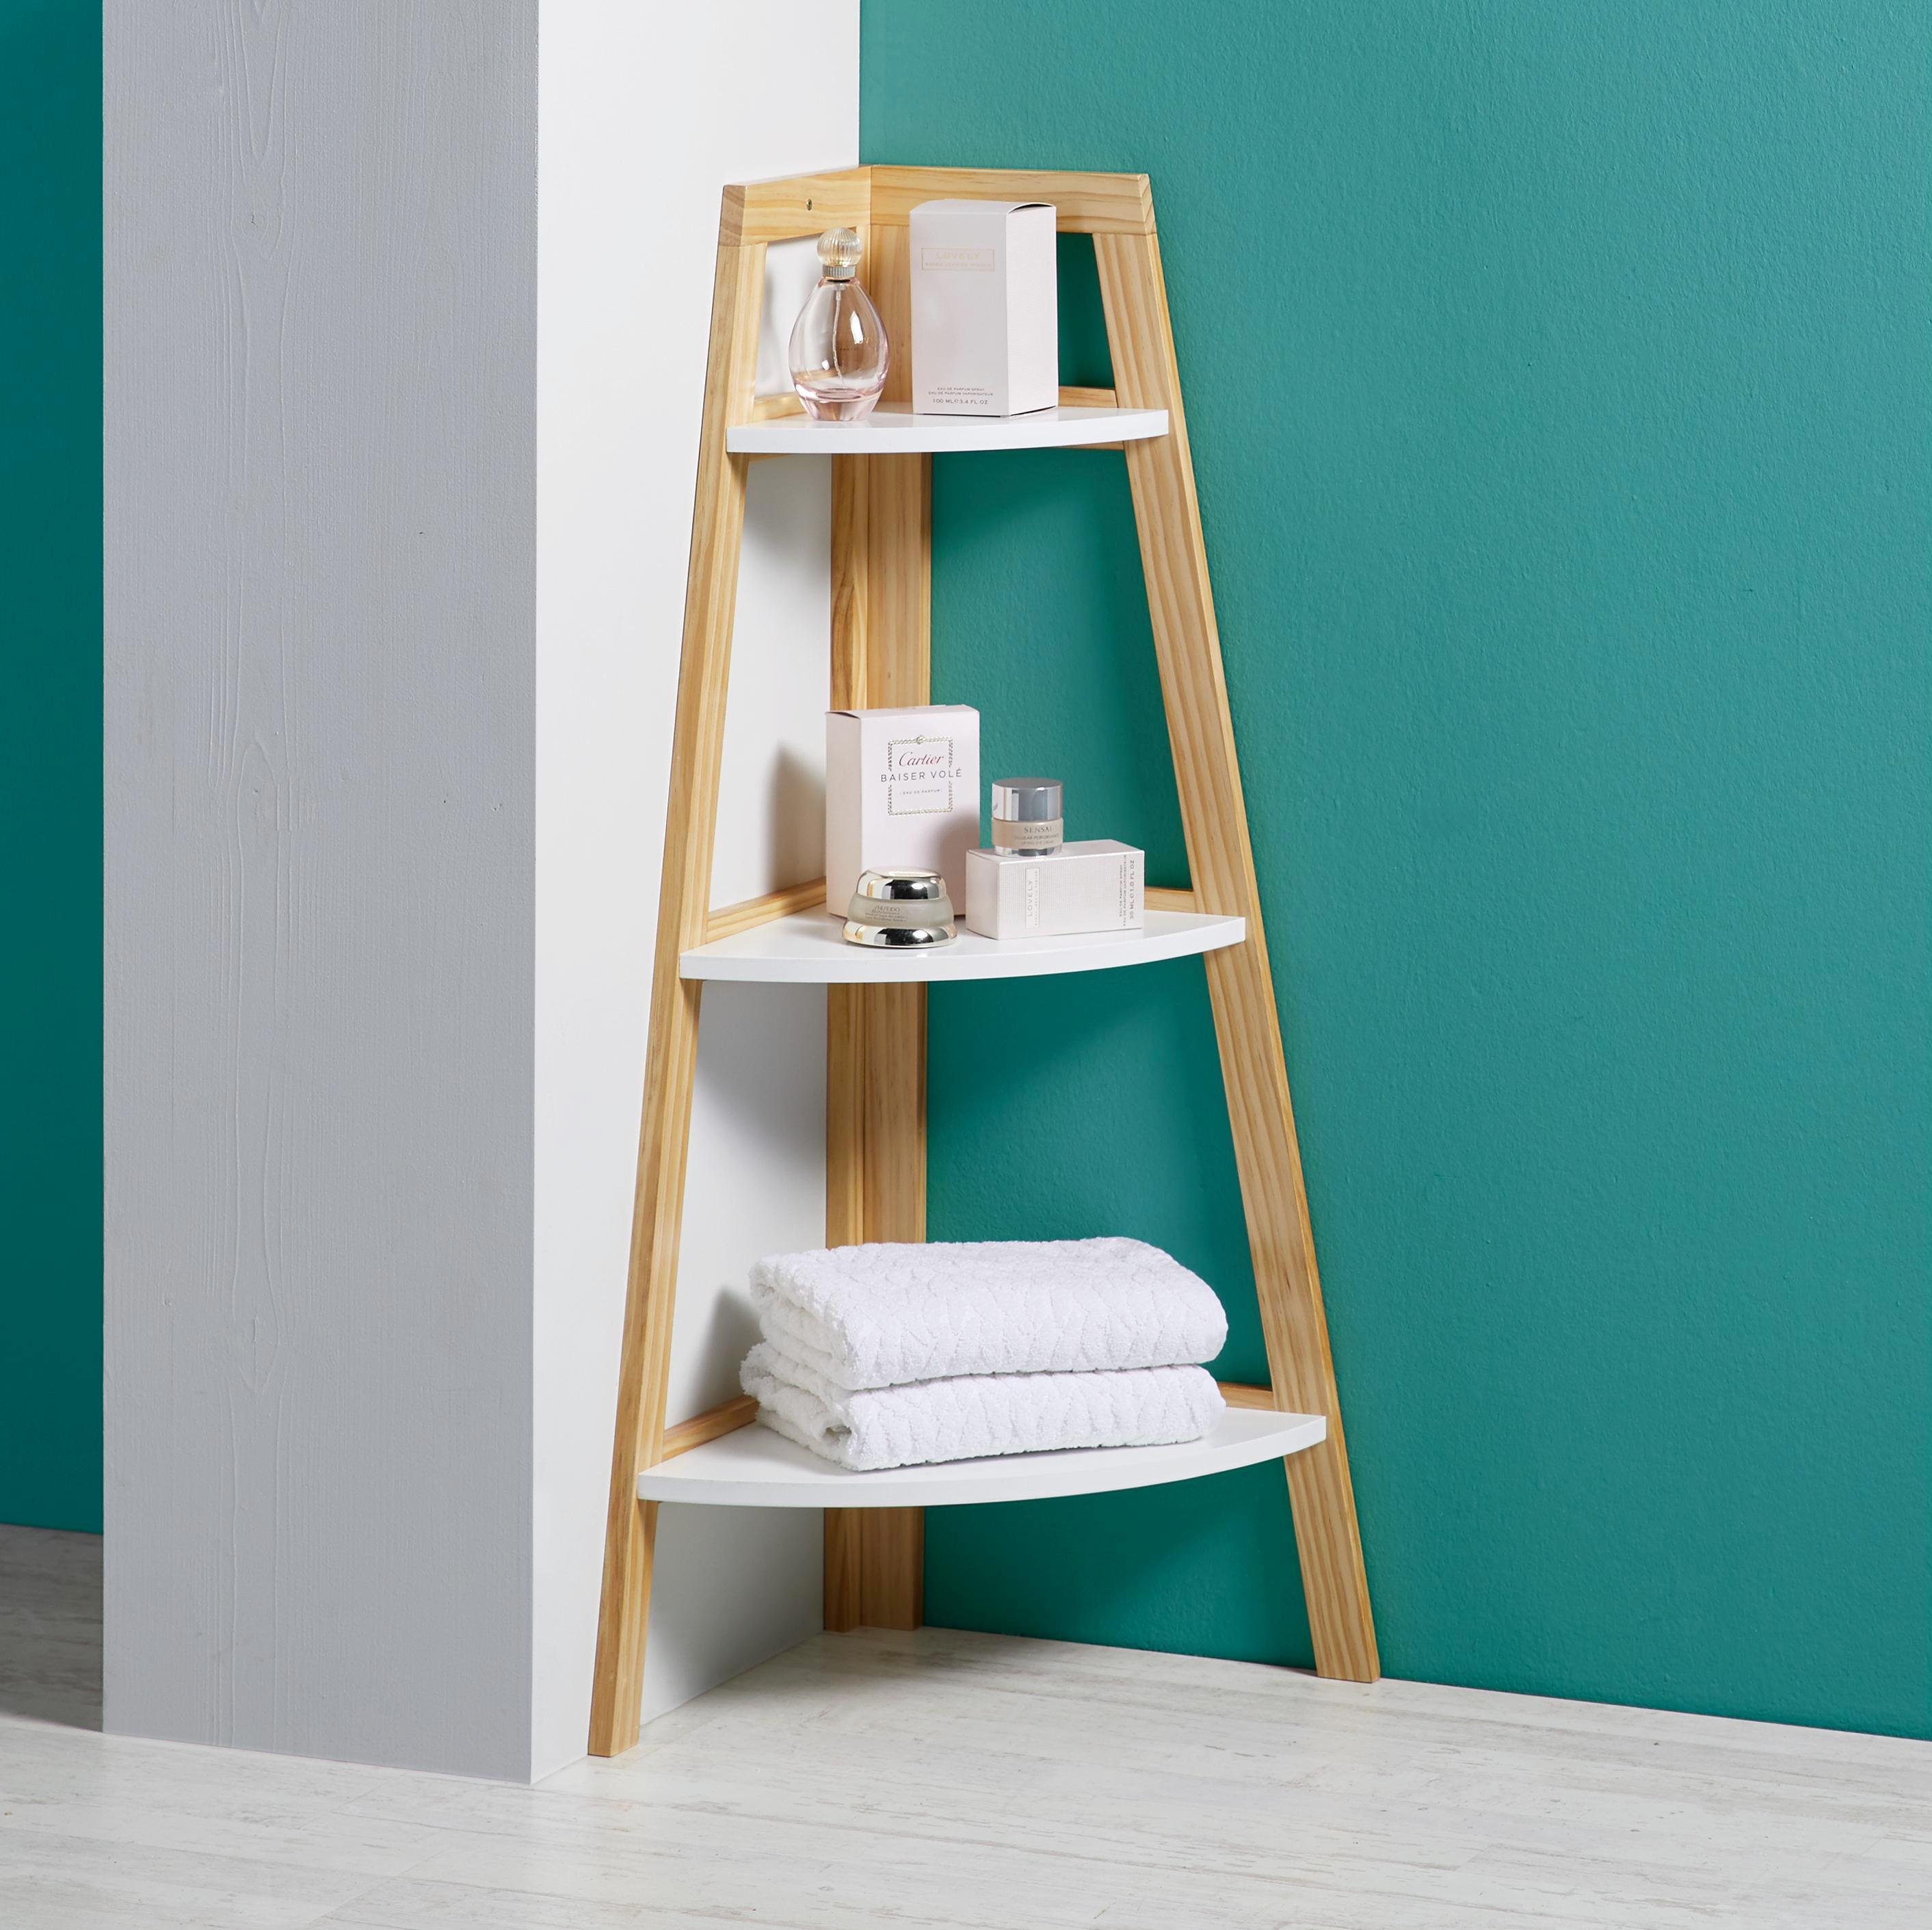 Badezimmerregal Mirella online kaufen ➤ mömax | {Badezimmer regal 22}